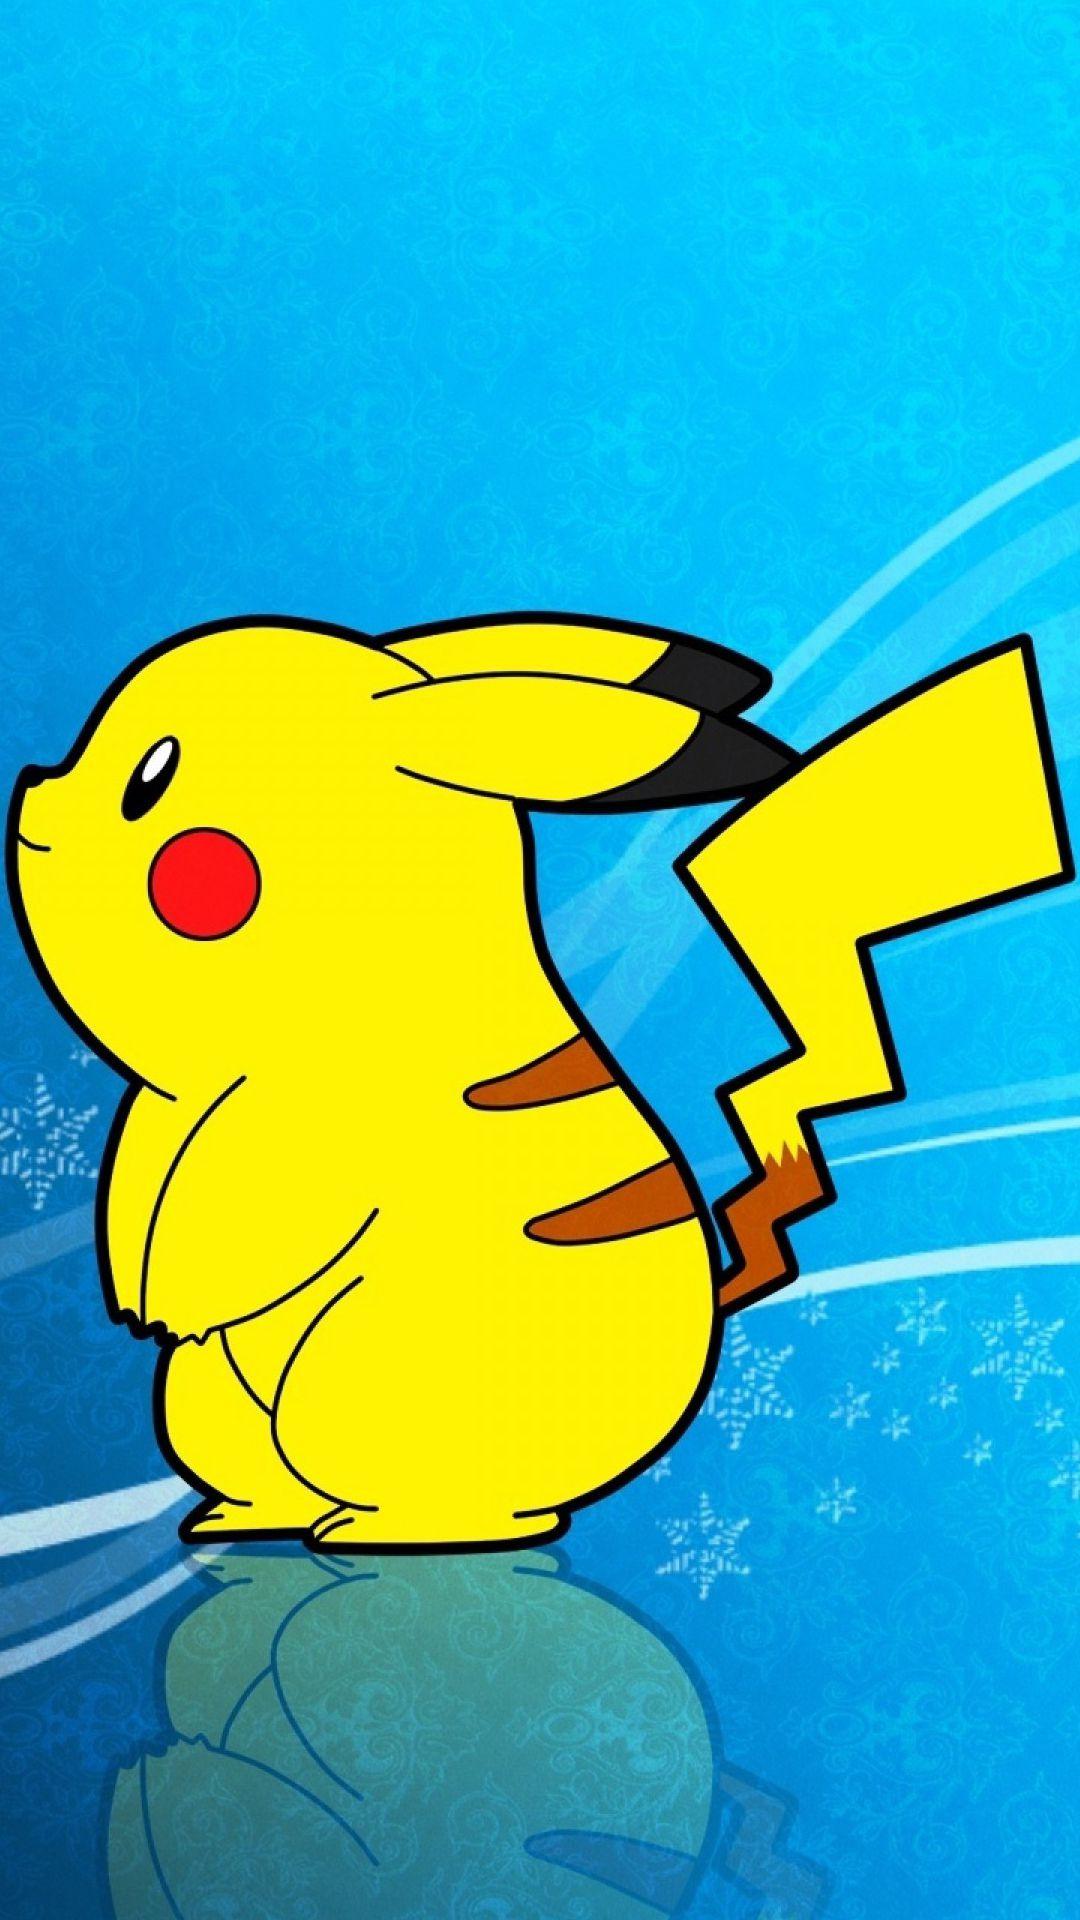 Pokemon Cool iPhone 5 wallpaper